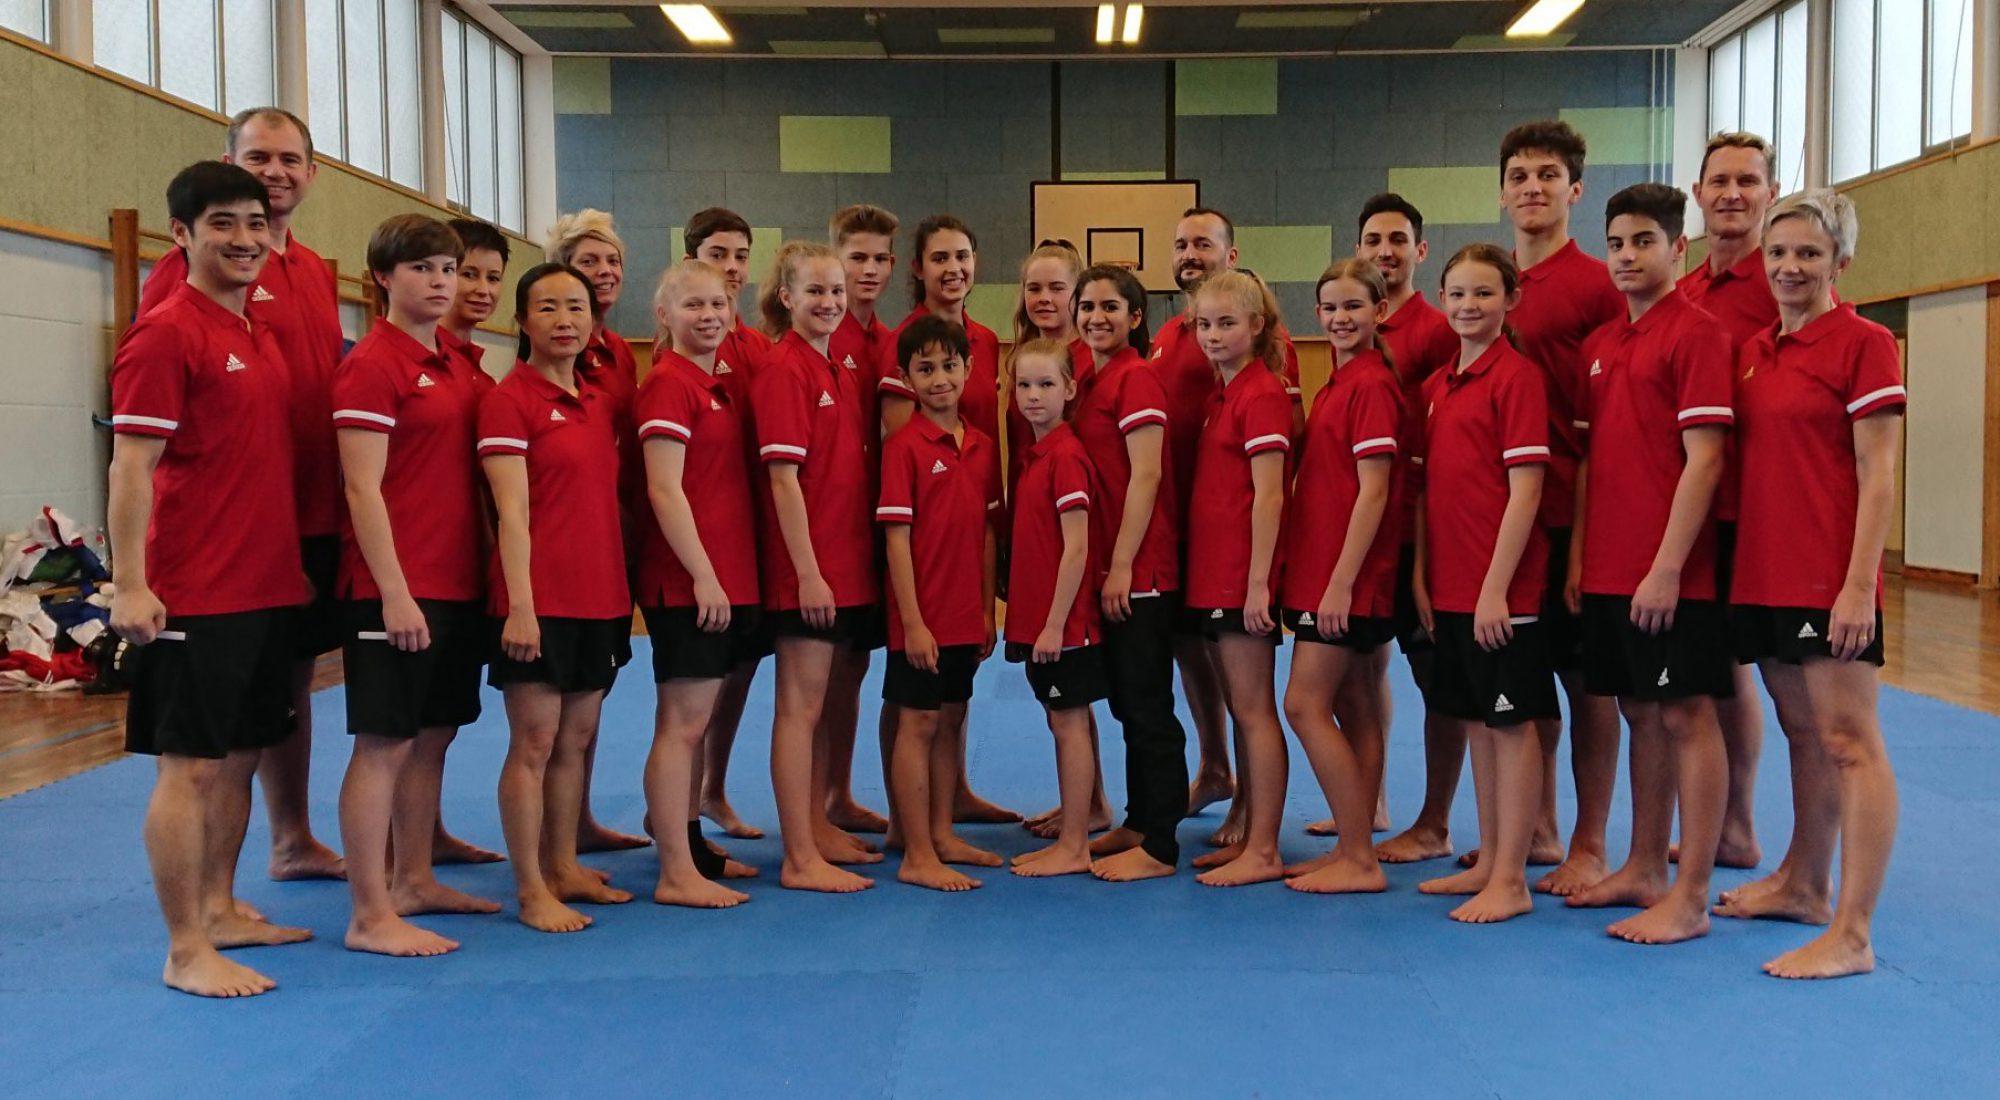 Hessische Taekwondo Union